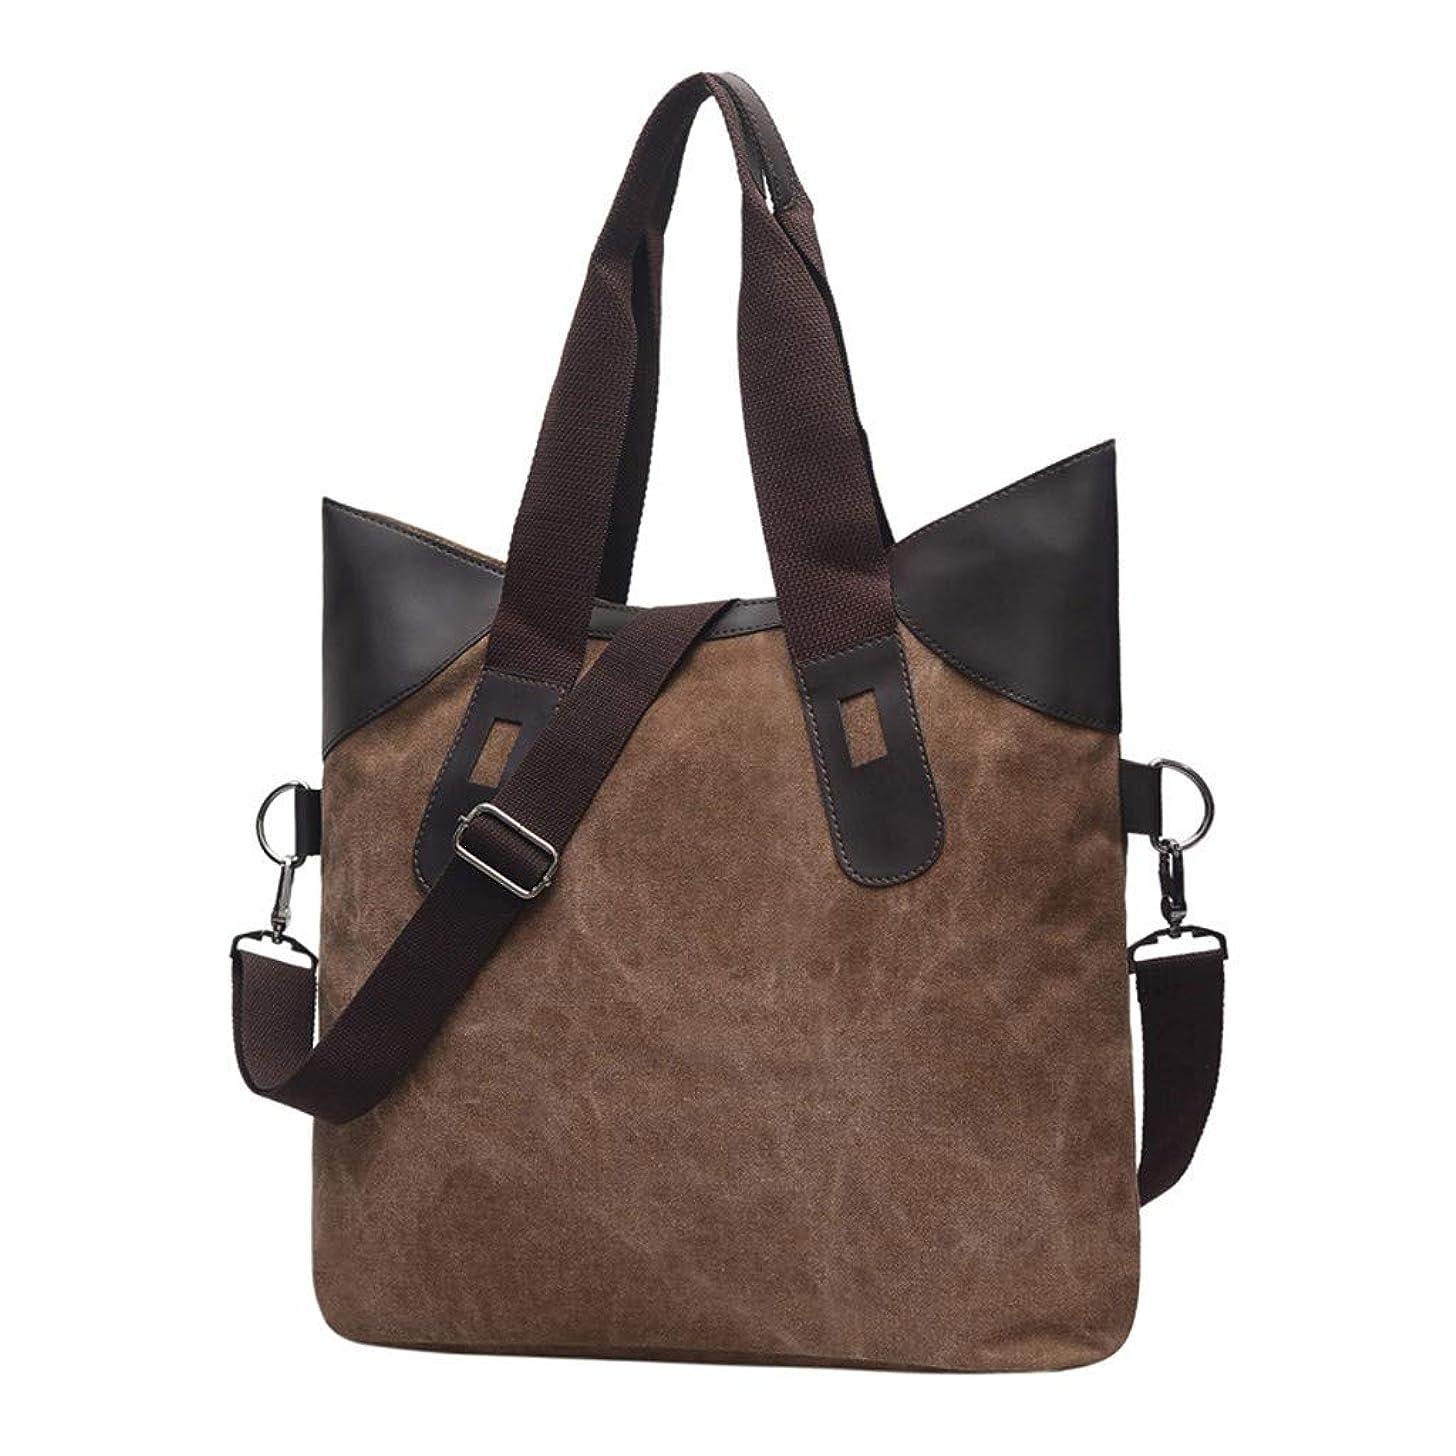 Fitfulvan Bag Women's Contrast color Handbag Large-Capacity Color Matching Wild Shoulder Bag Crossbody Packet